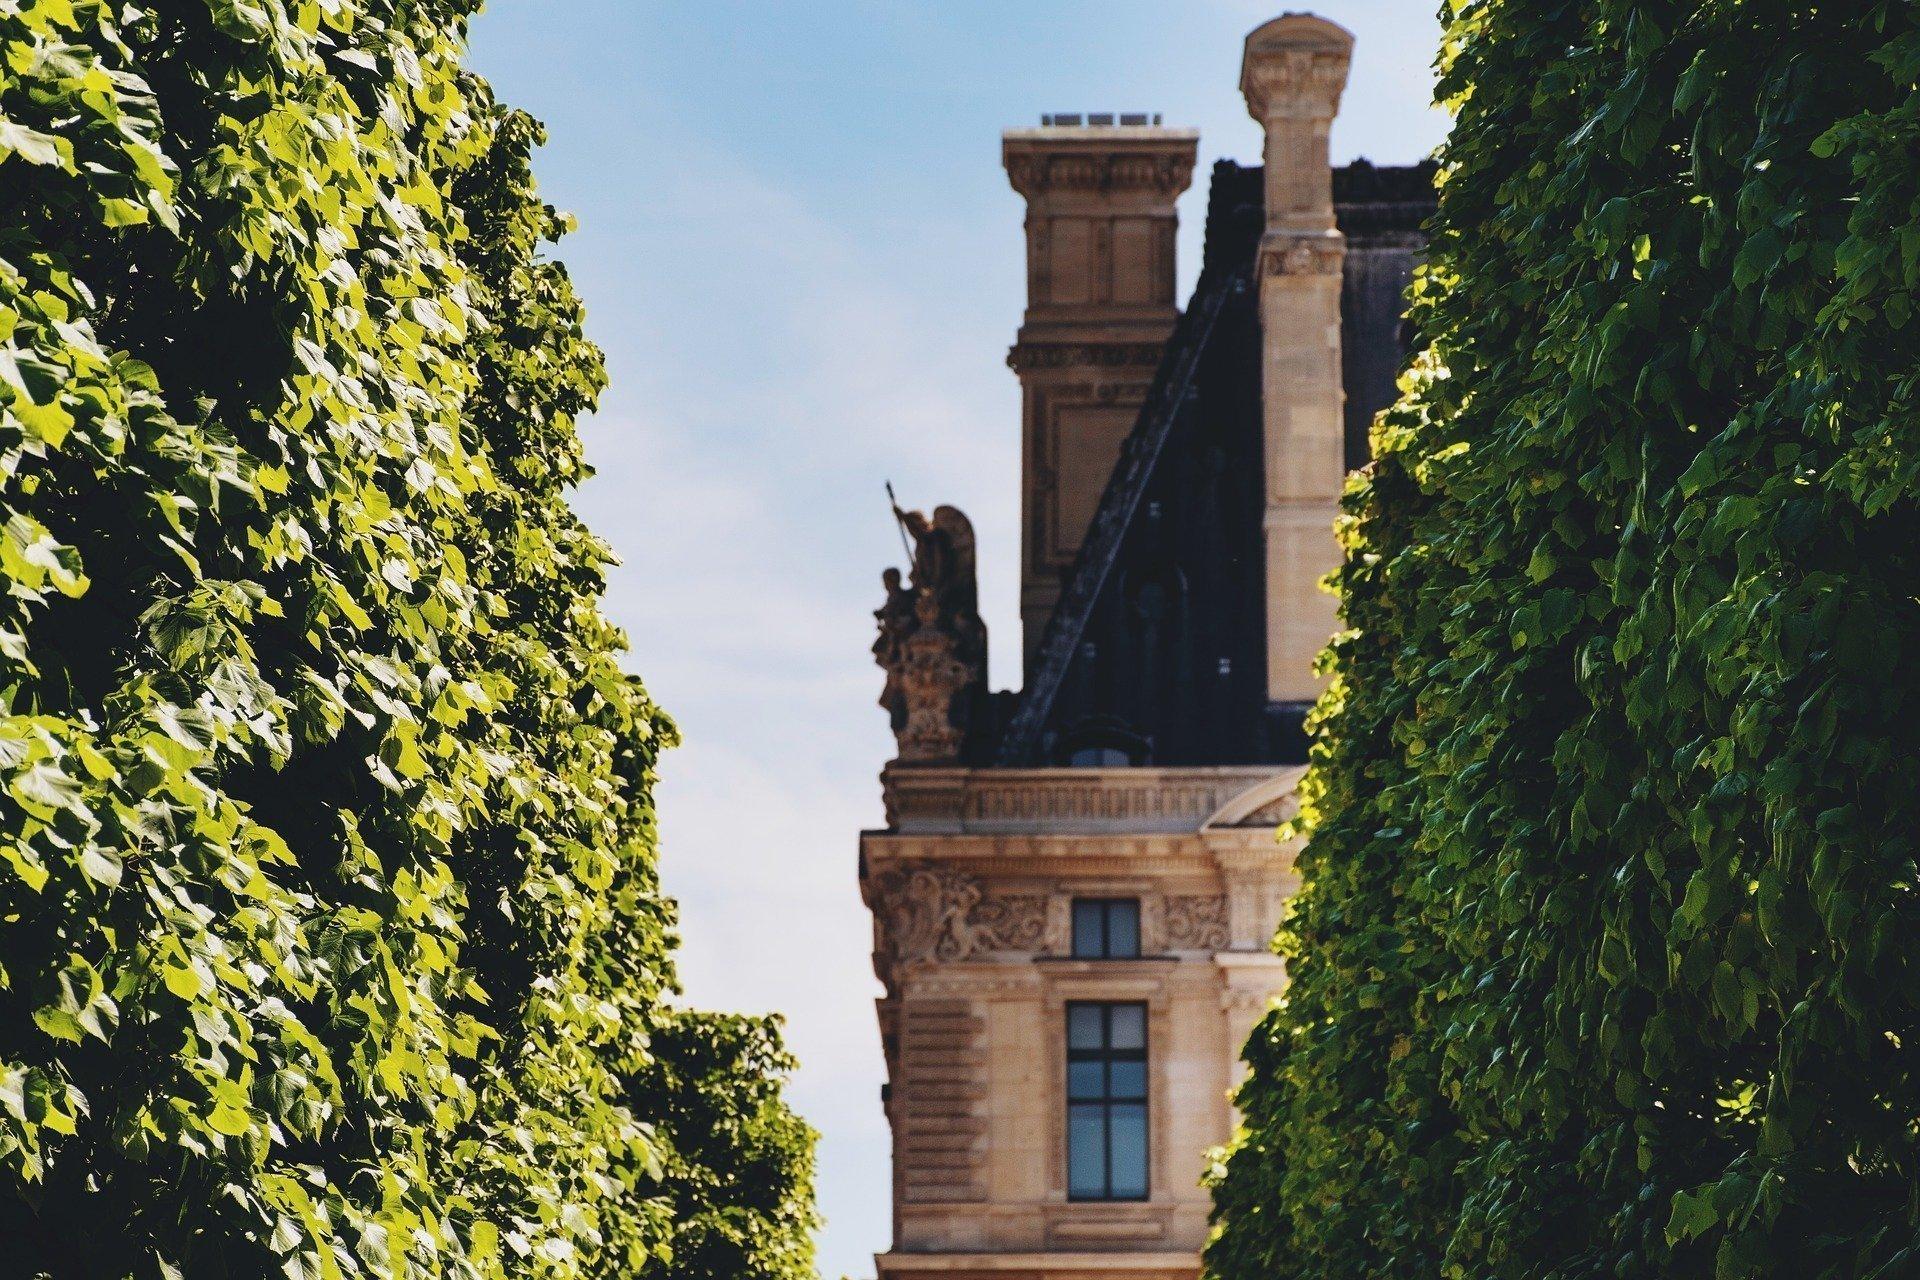 Tuileries Gardens hedges